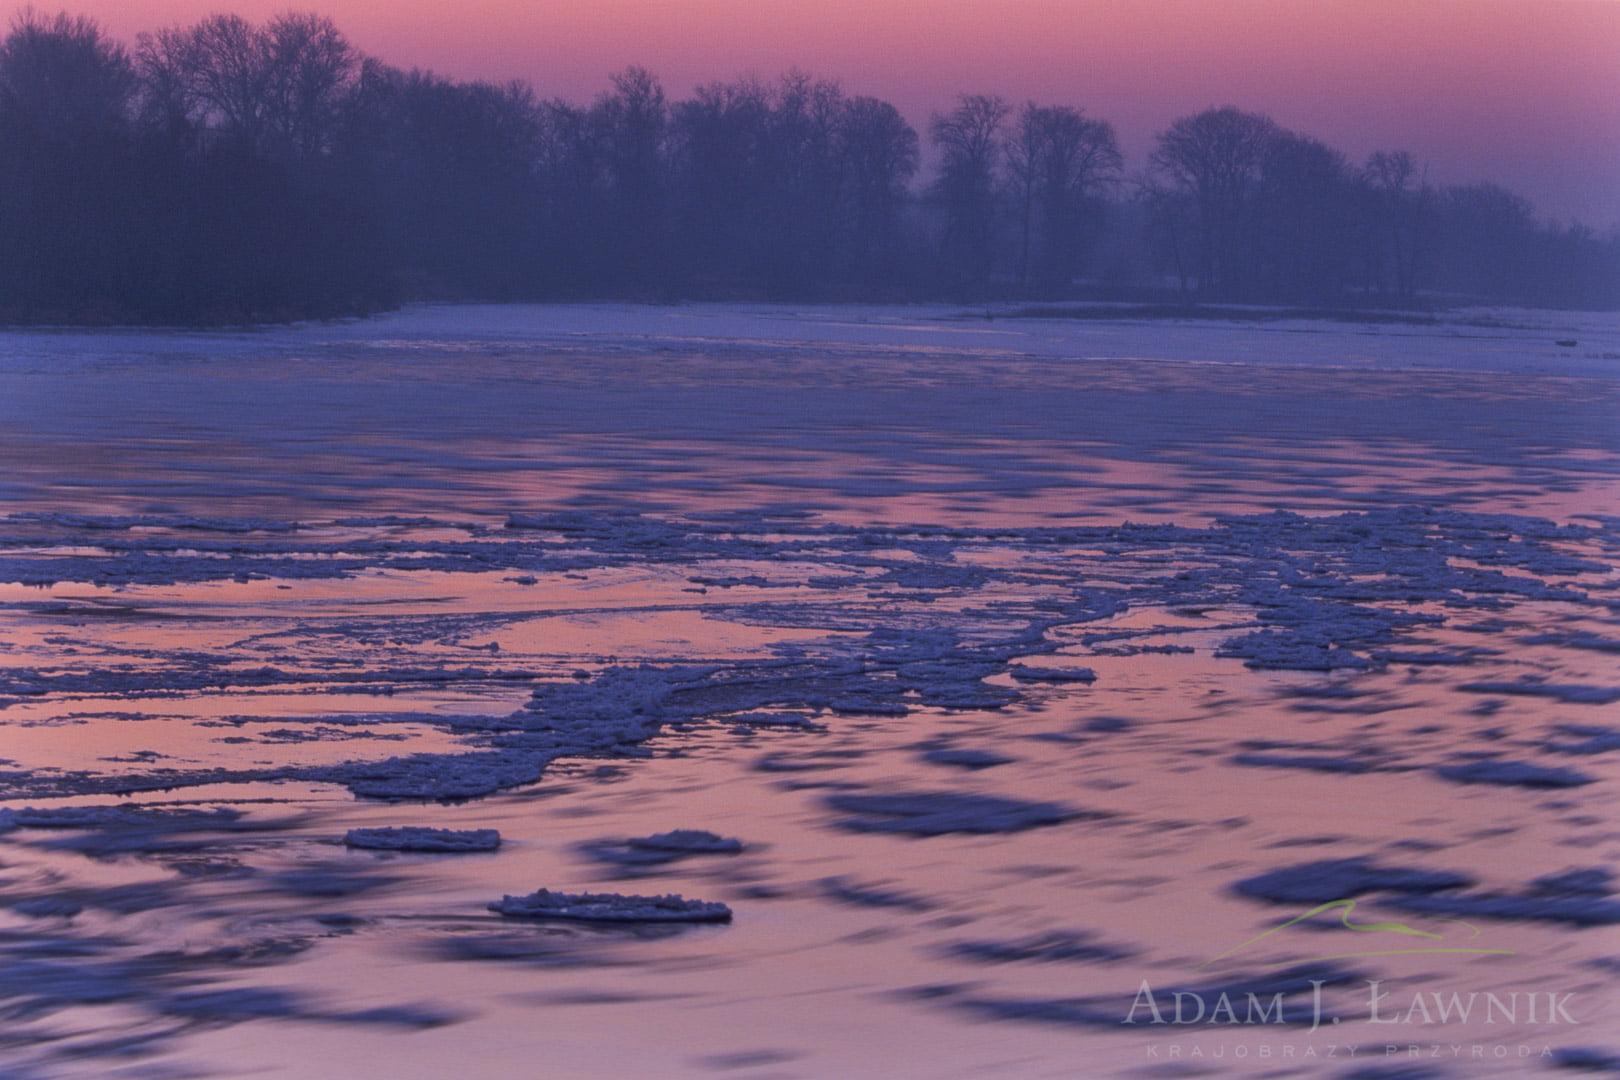 Middle Vistula Valley, Poland 0502-00826P